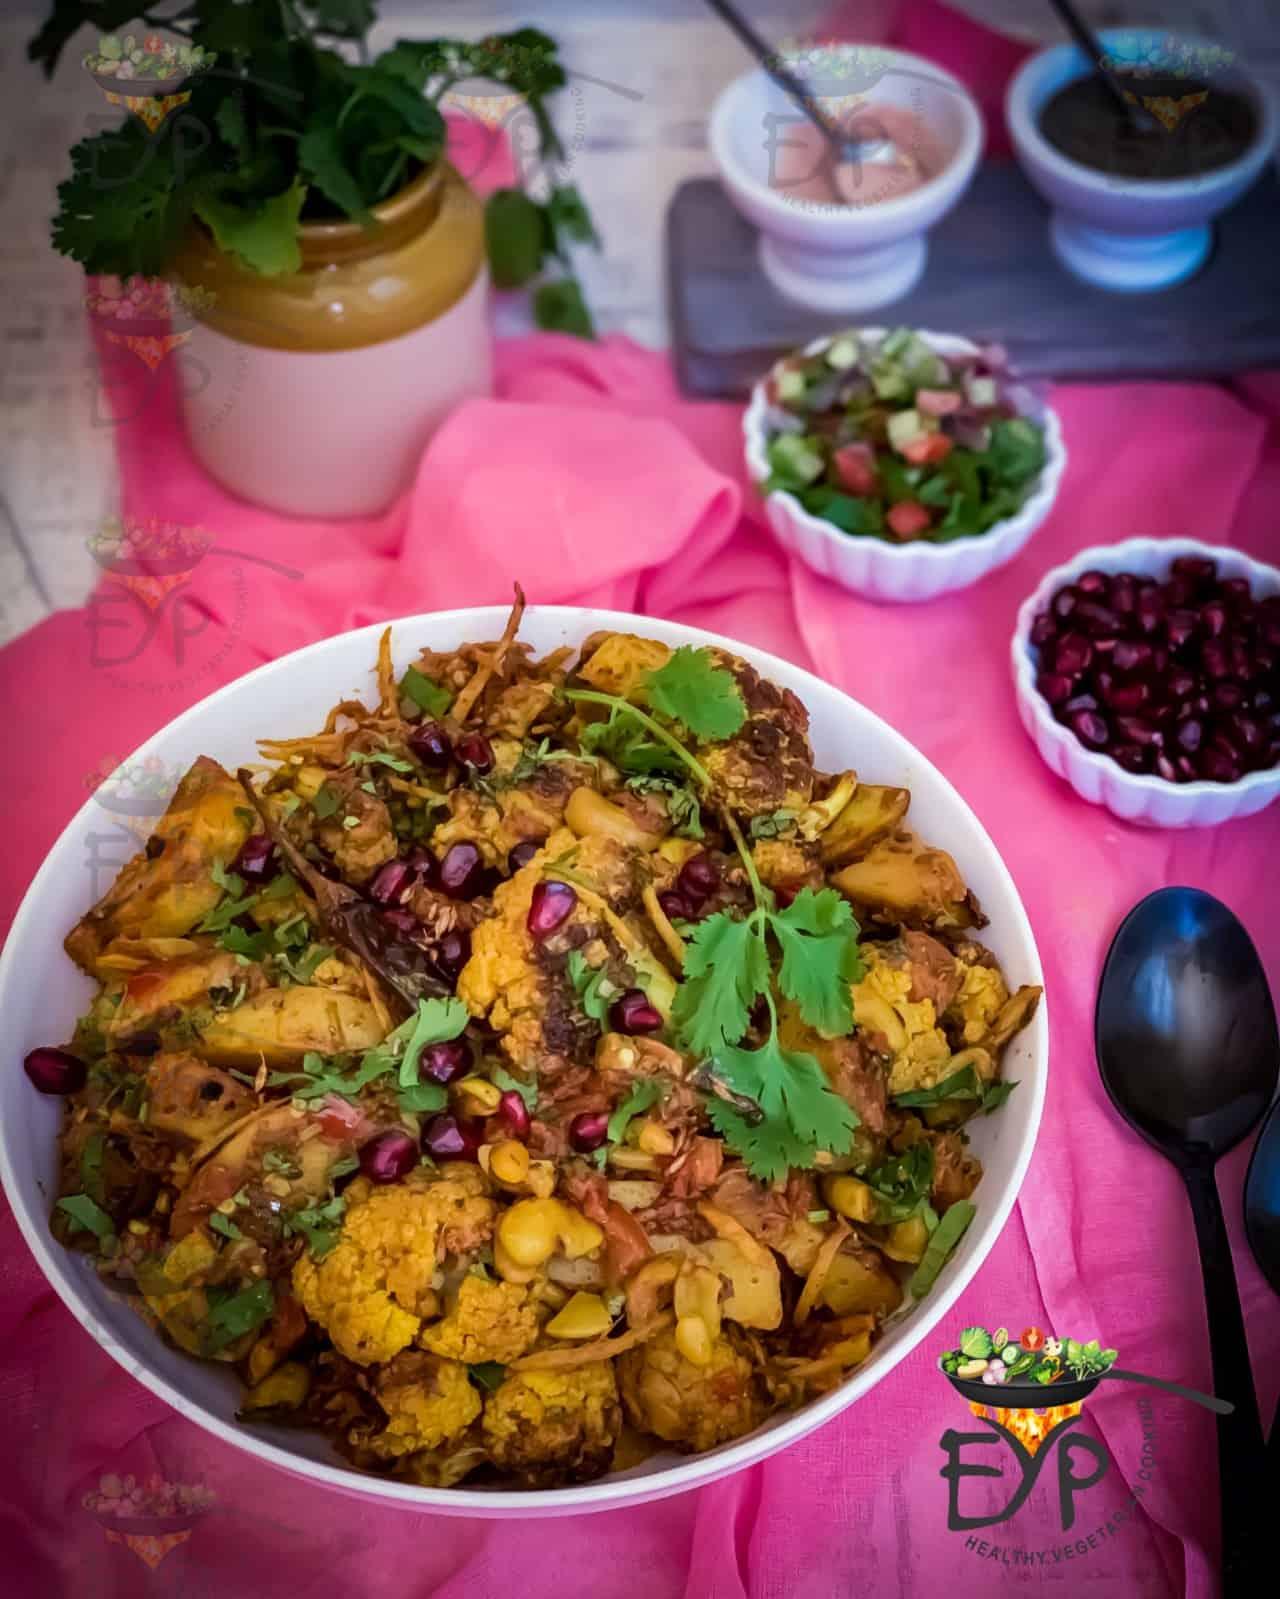 Aloo Gobi subzi - vegetable curry